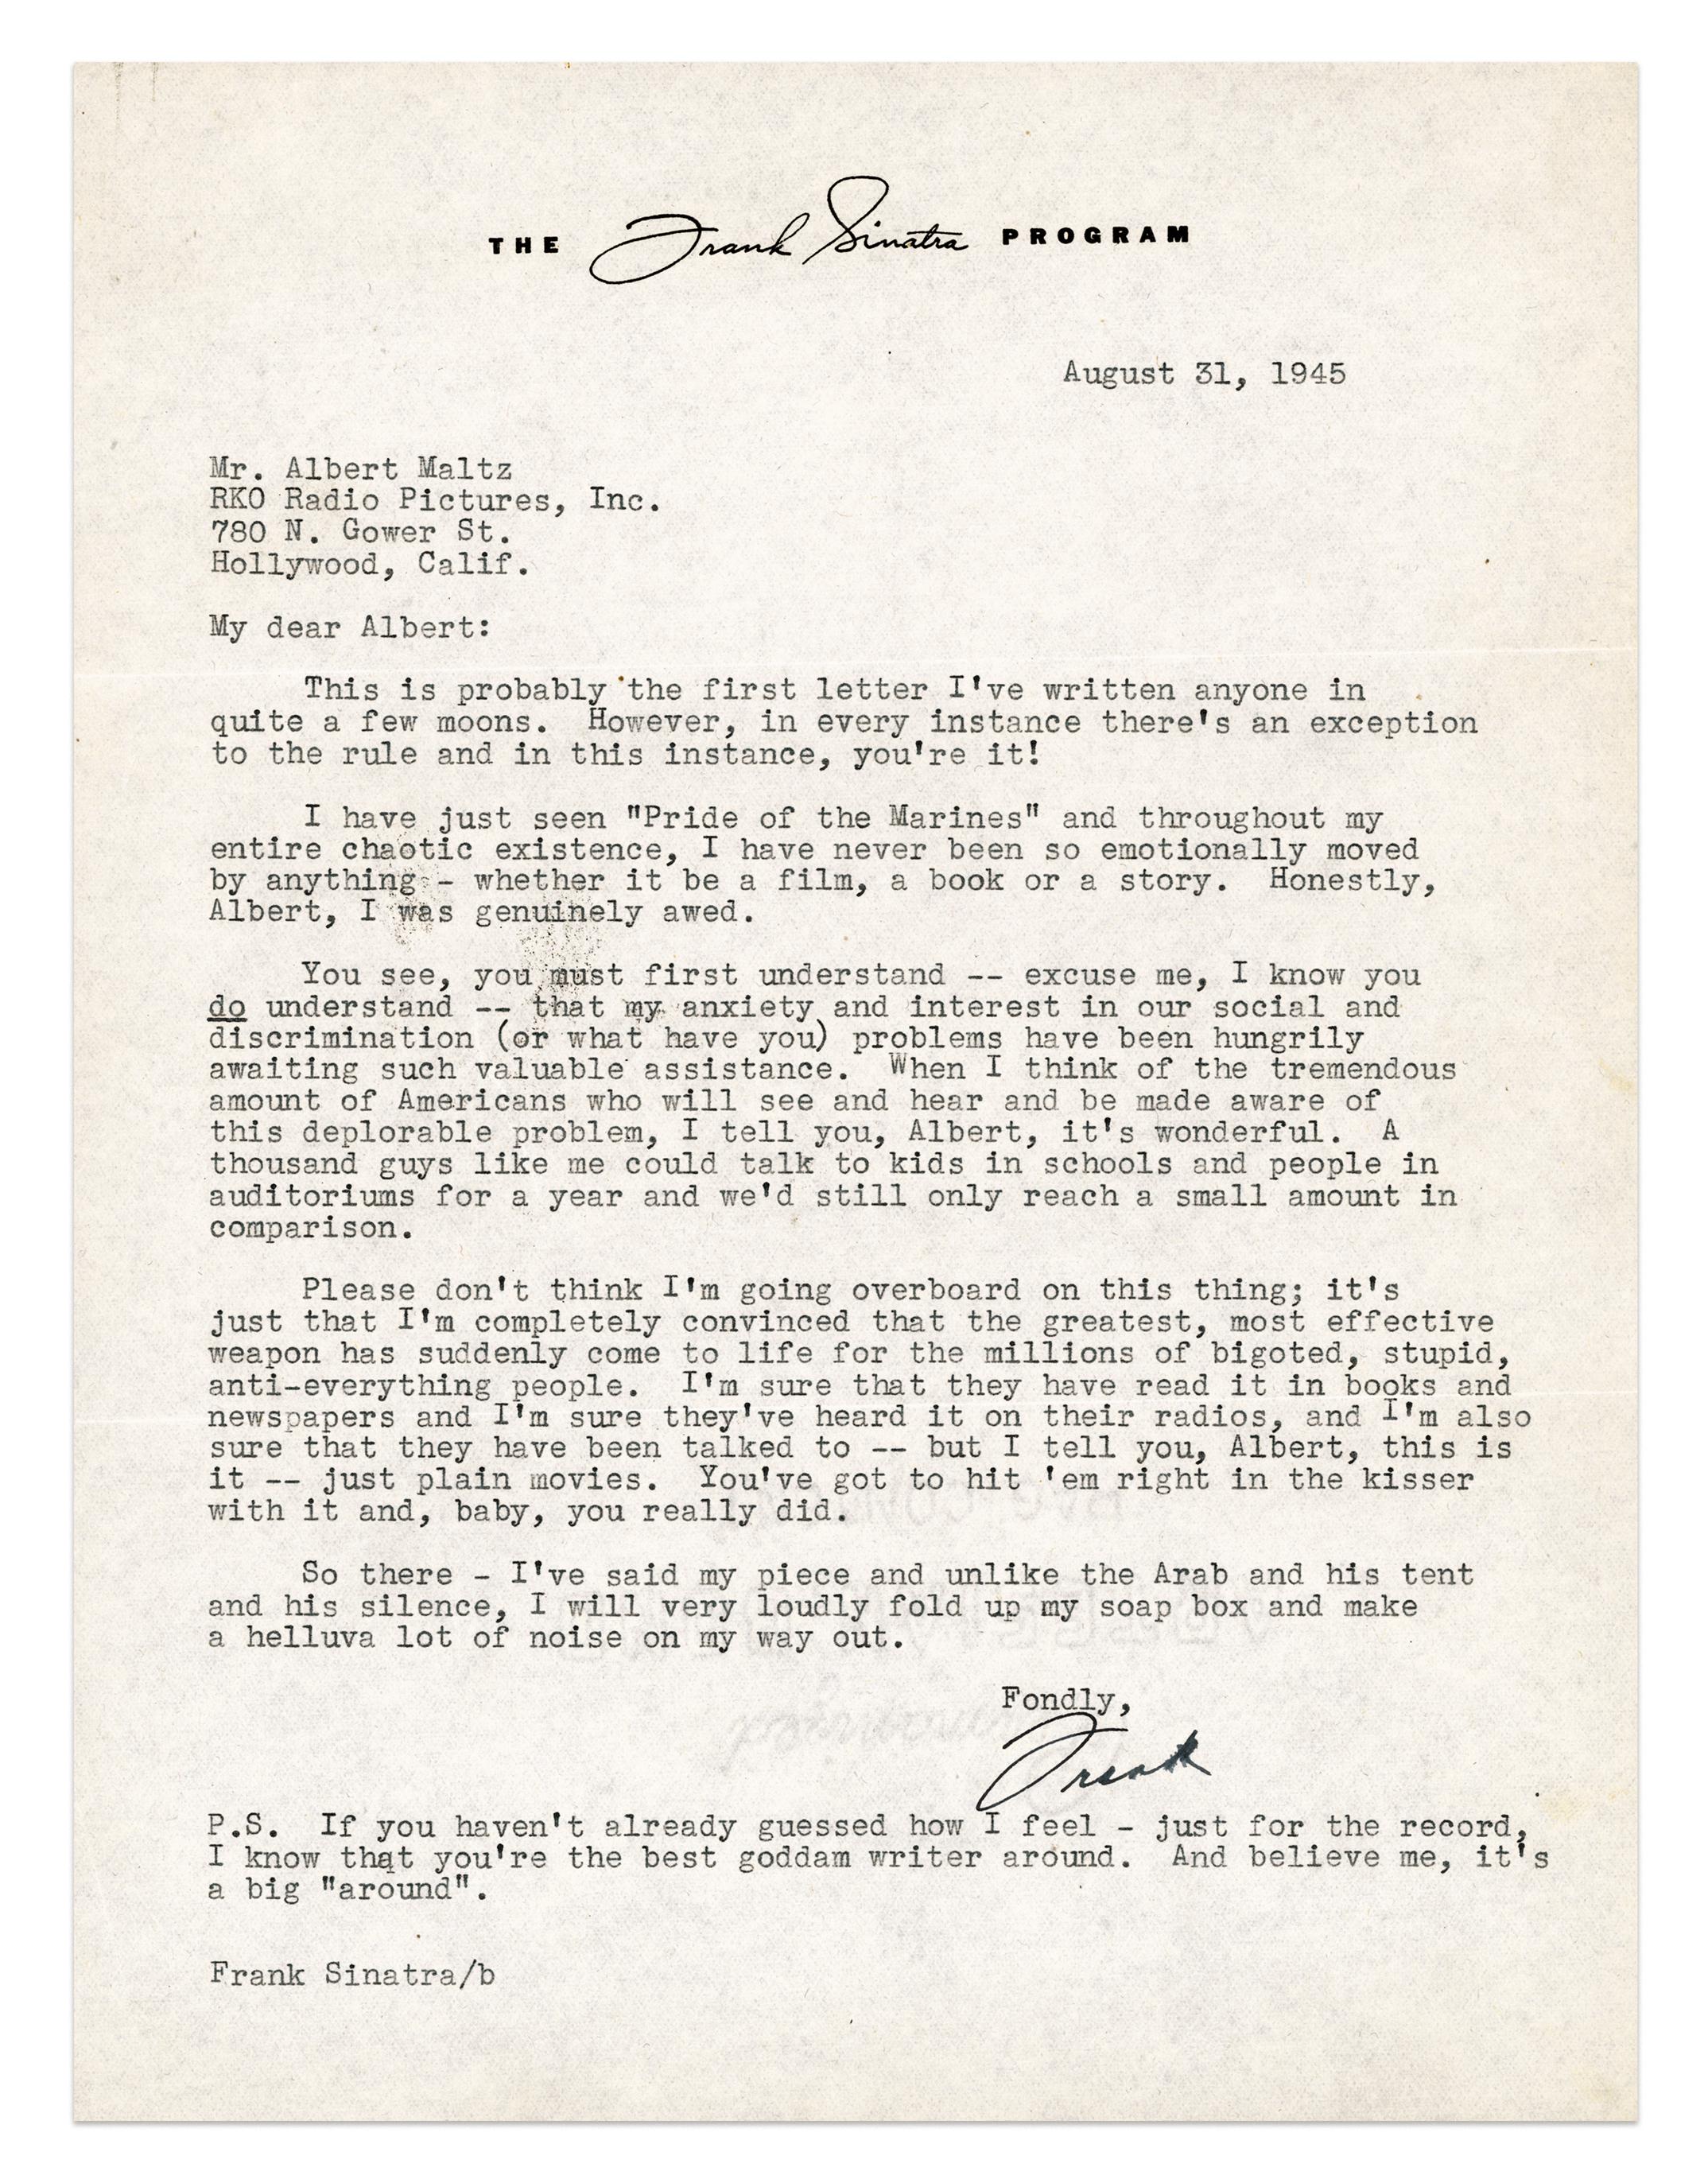 Frank Sinatra's letter to Albert Maltz. Aug. 31, 1945.